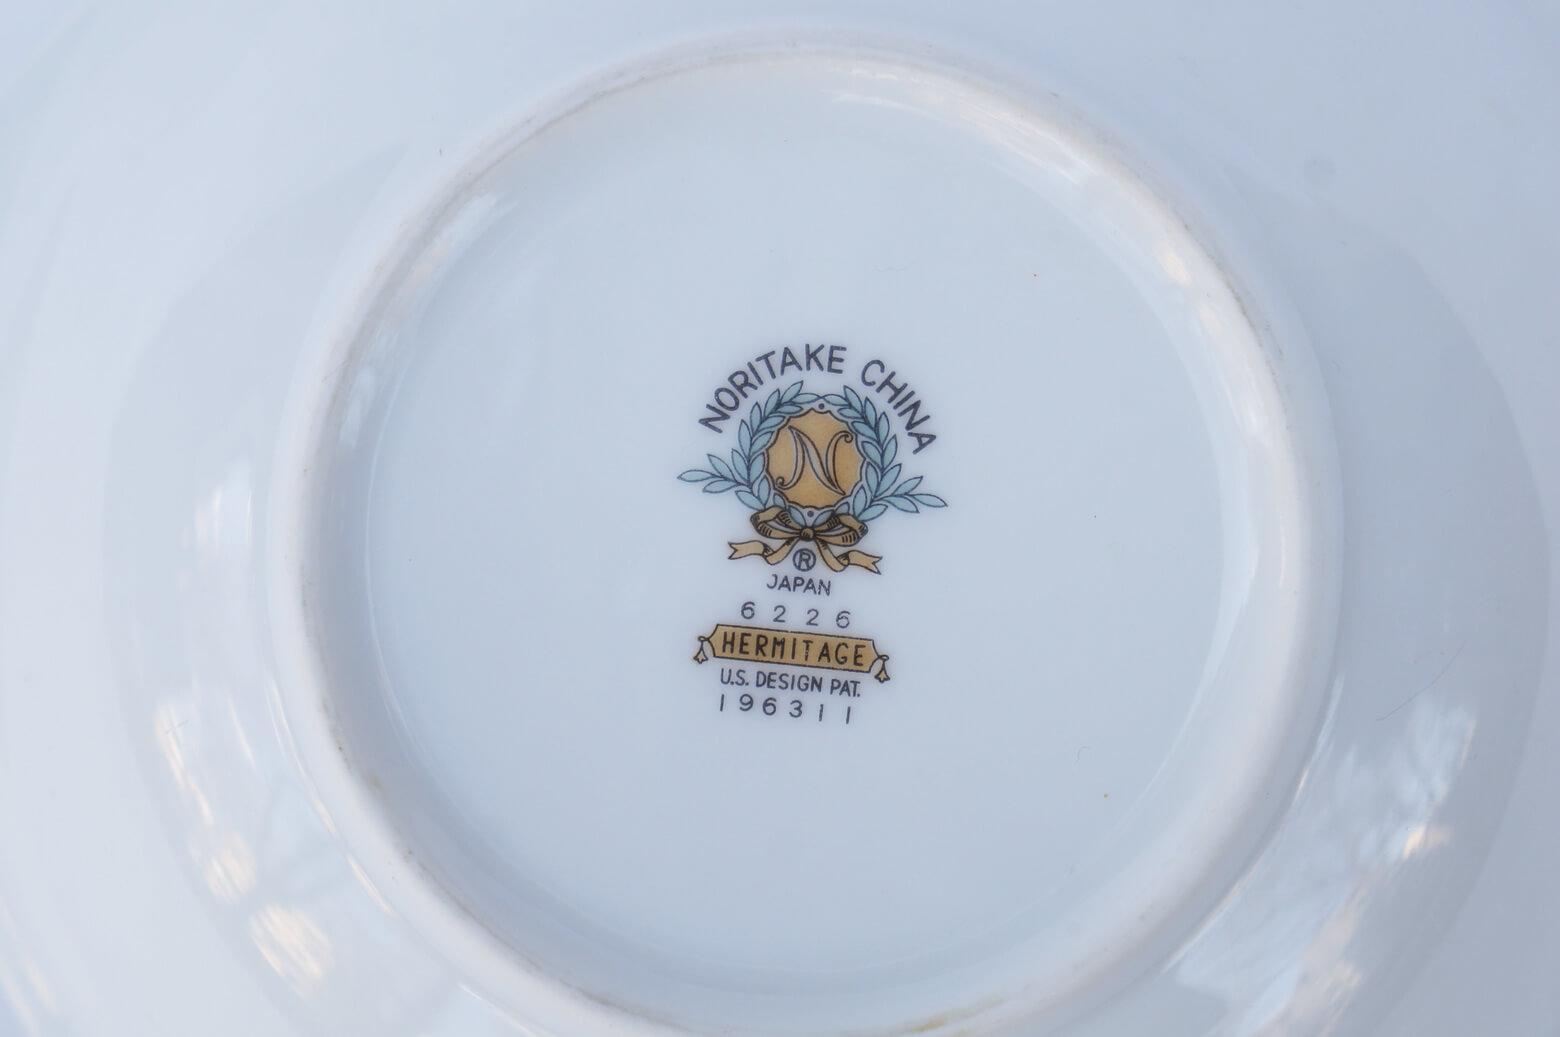 Vintage Noritake Oval Plate Hermitage U.S. Pattern Tableware/ノリタケ オーバル プレート エルミタージュ テーブルウェア レトロ ヴィンテージ食器 Mサイズ